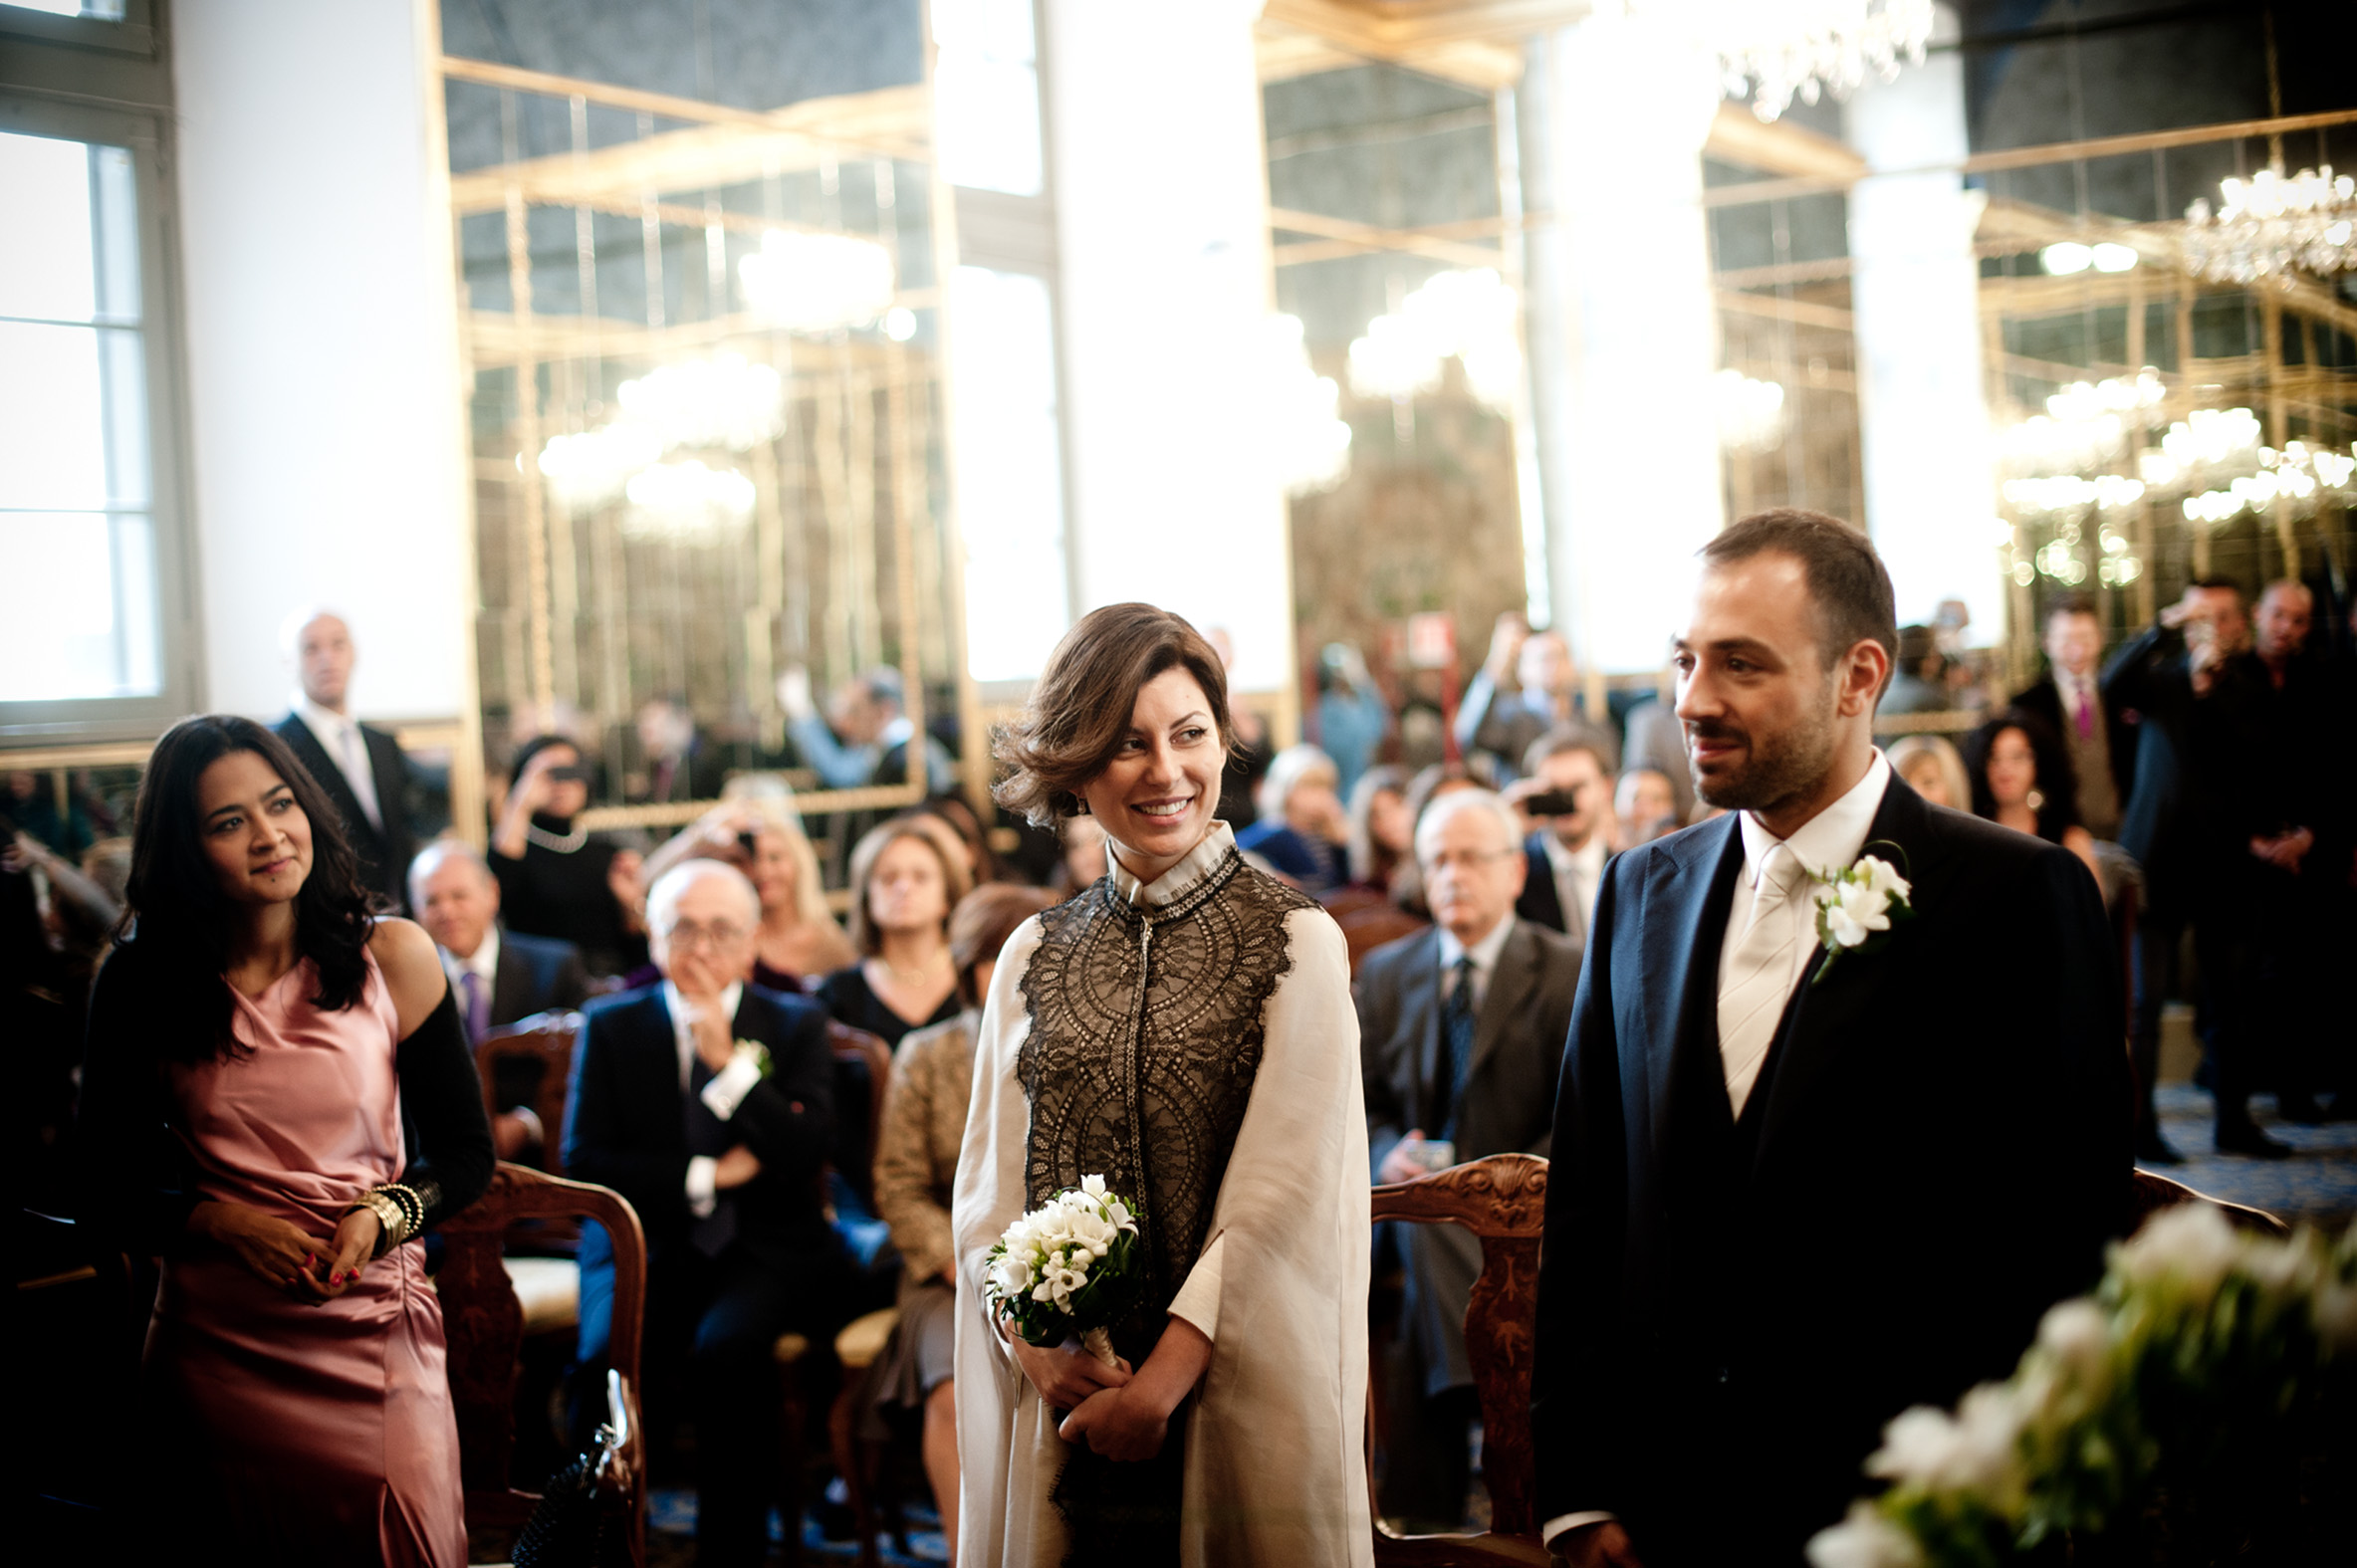 cdc454361c72 ... 06 matrimonio milano palazzo reale 07 matrimonio civile ...